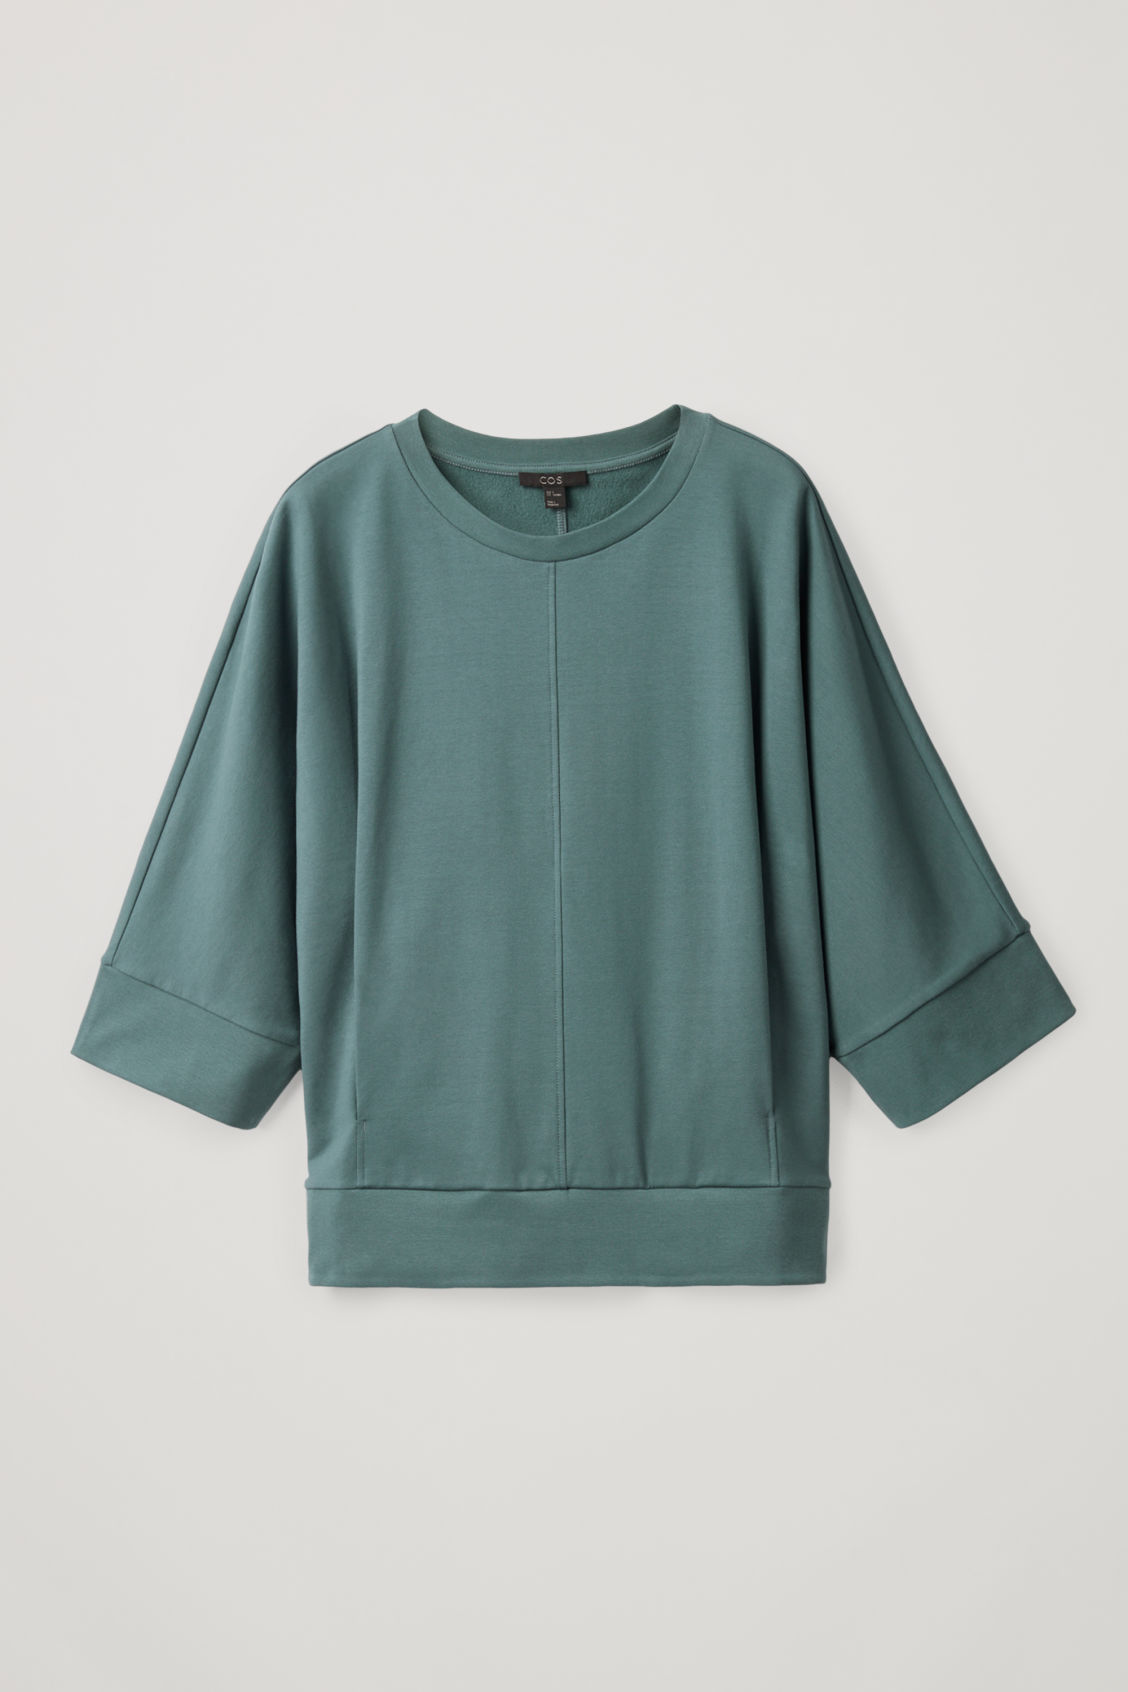 Cos Oversized Jersey Sweatshirt In Turquoise